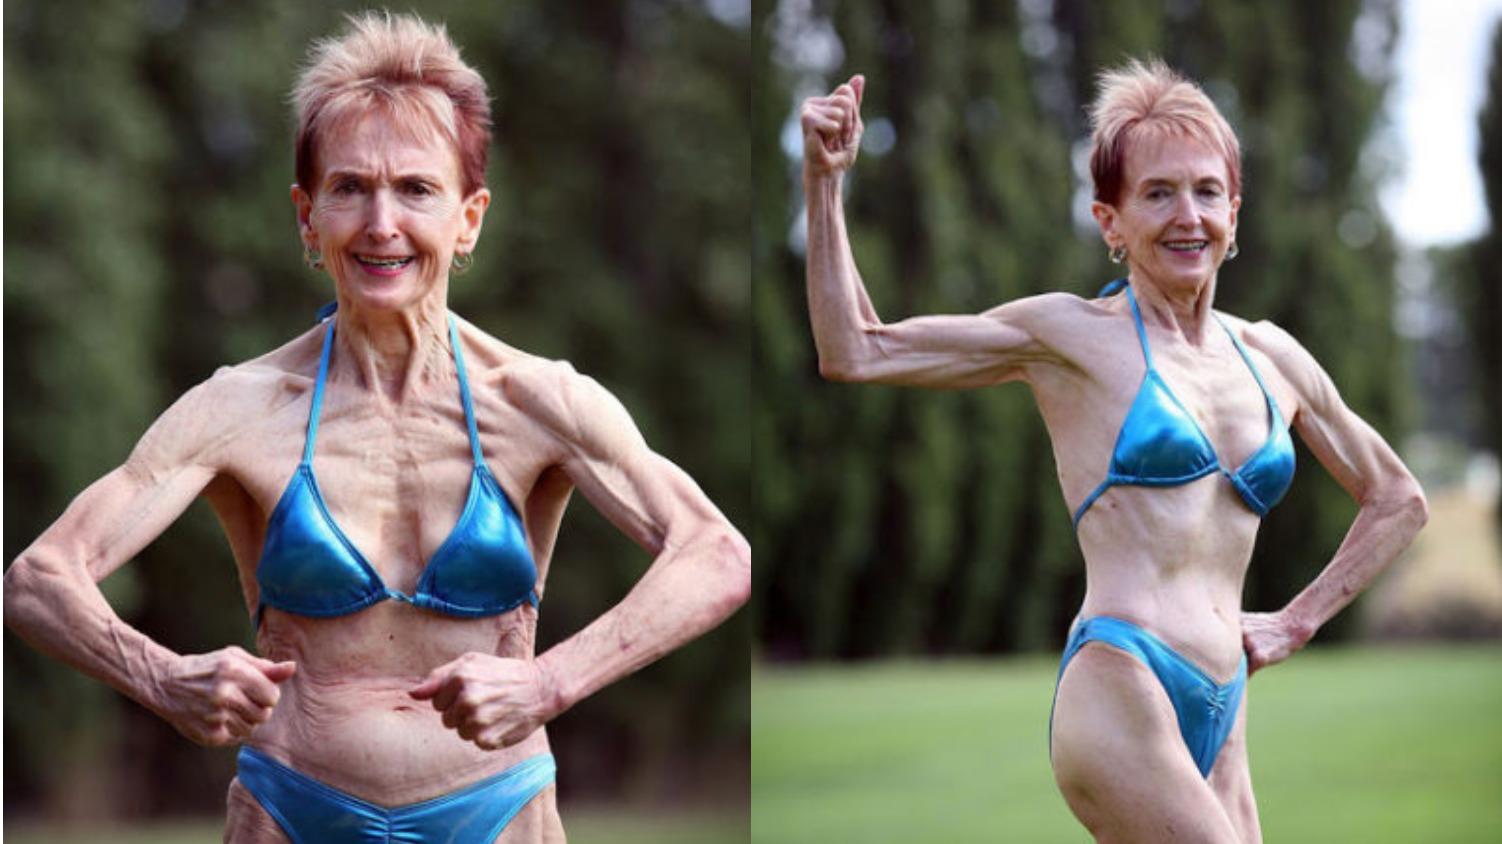 Пенсионерка занимается фитнесом